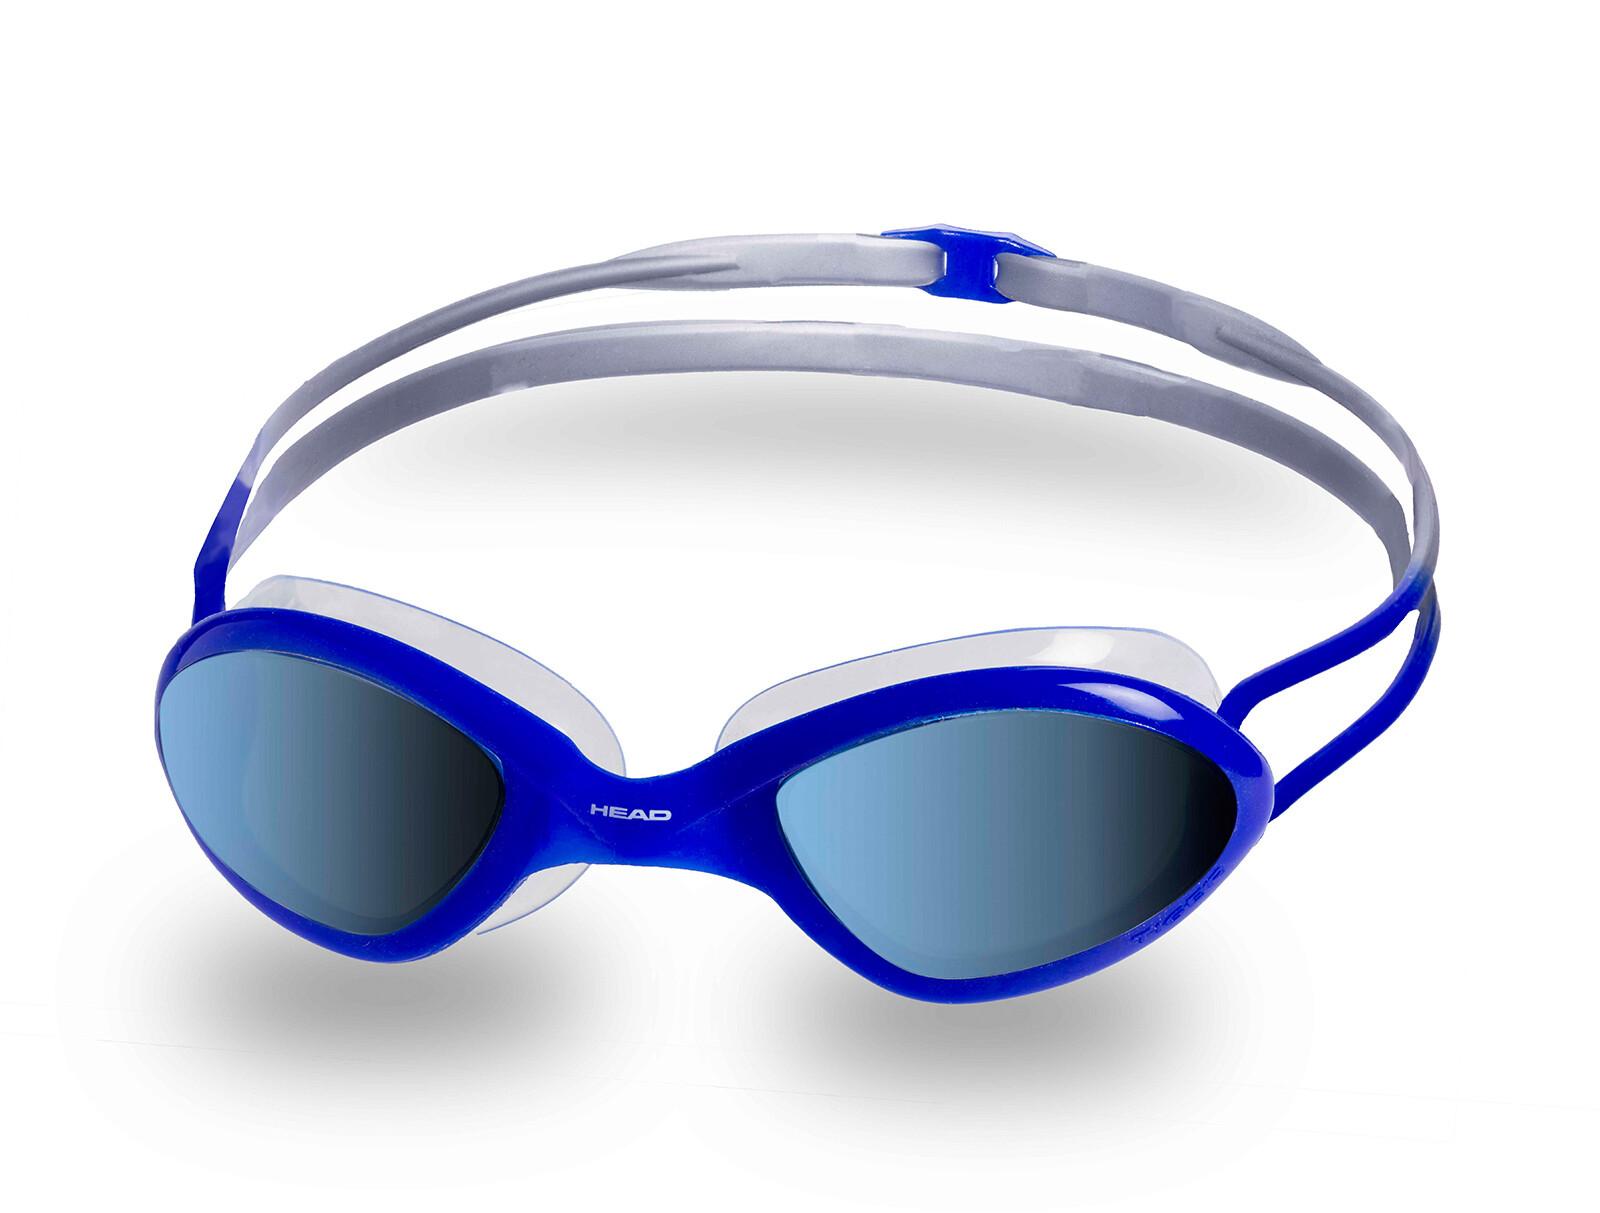 Head Tiger Race Mirrored LiquidSkin Svømmebriller, clear-blu-blue   Tri-beklædning